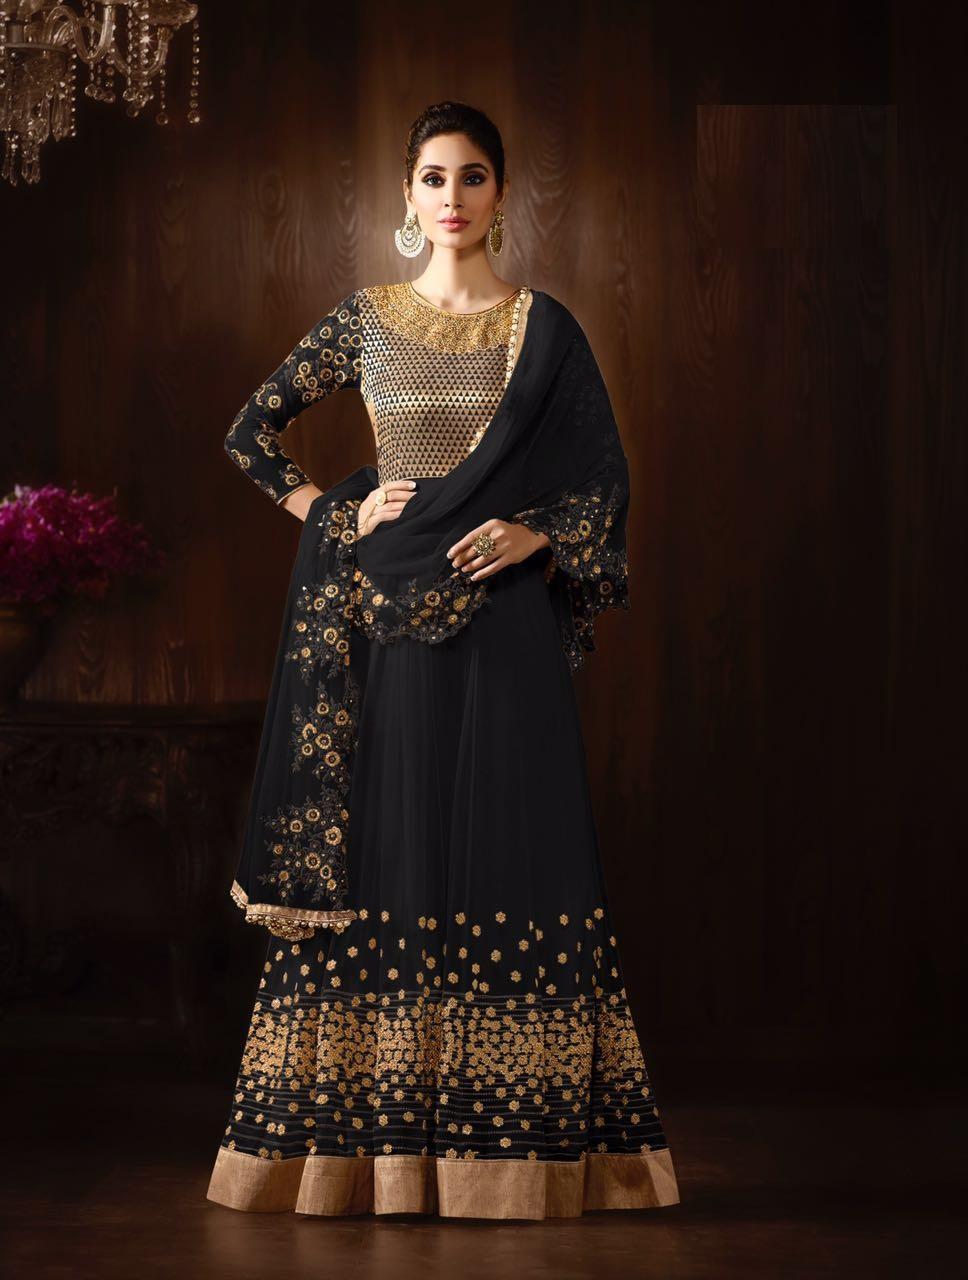 3b41617d88 Cheap Indian Party Dresses Uk - raveitsafe